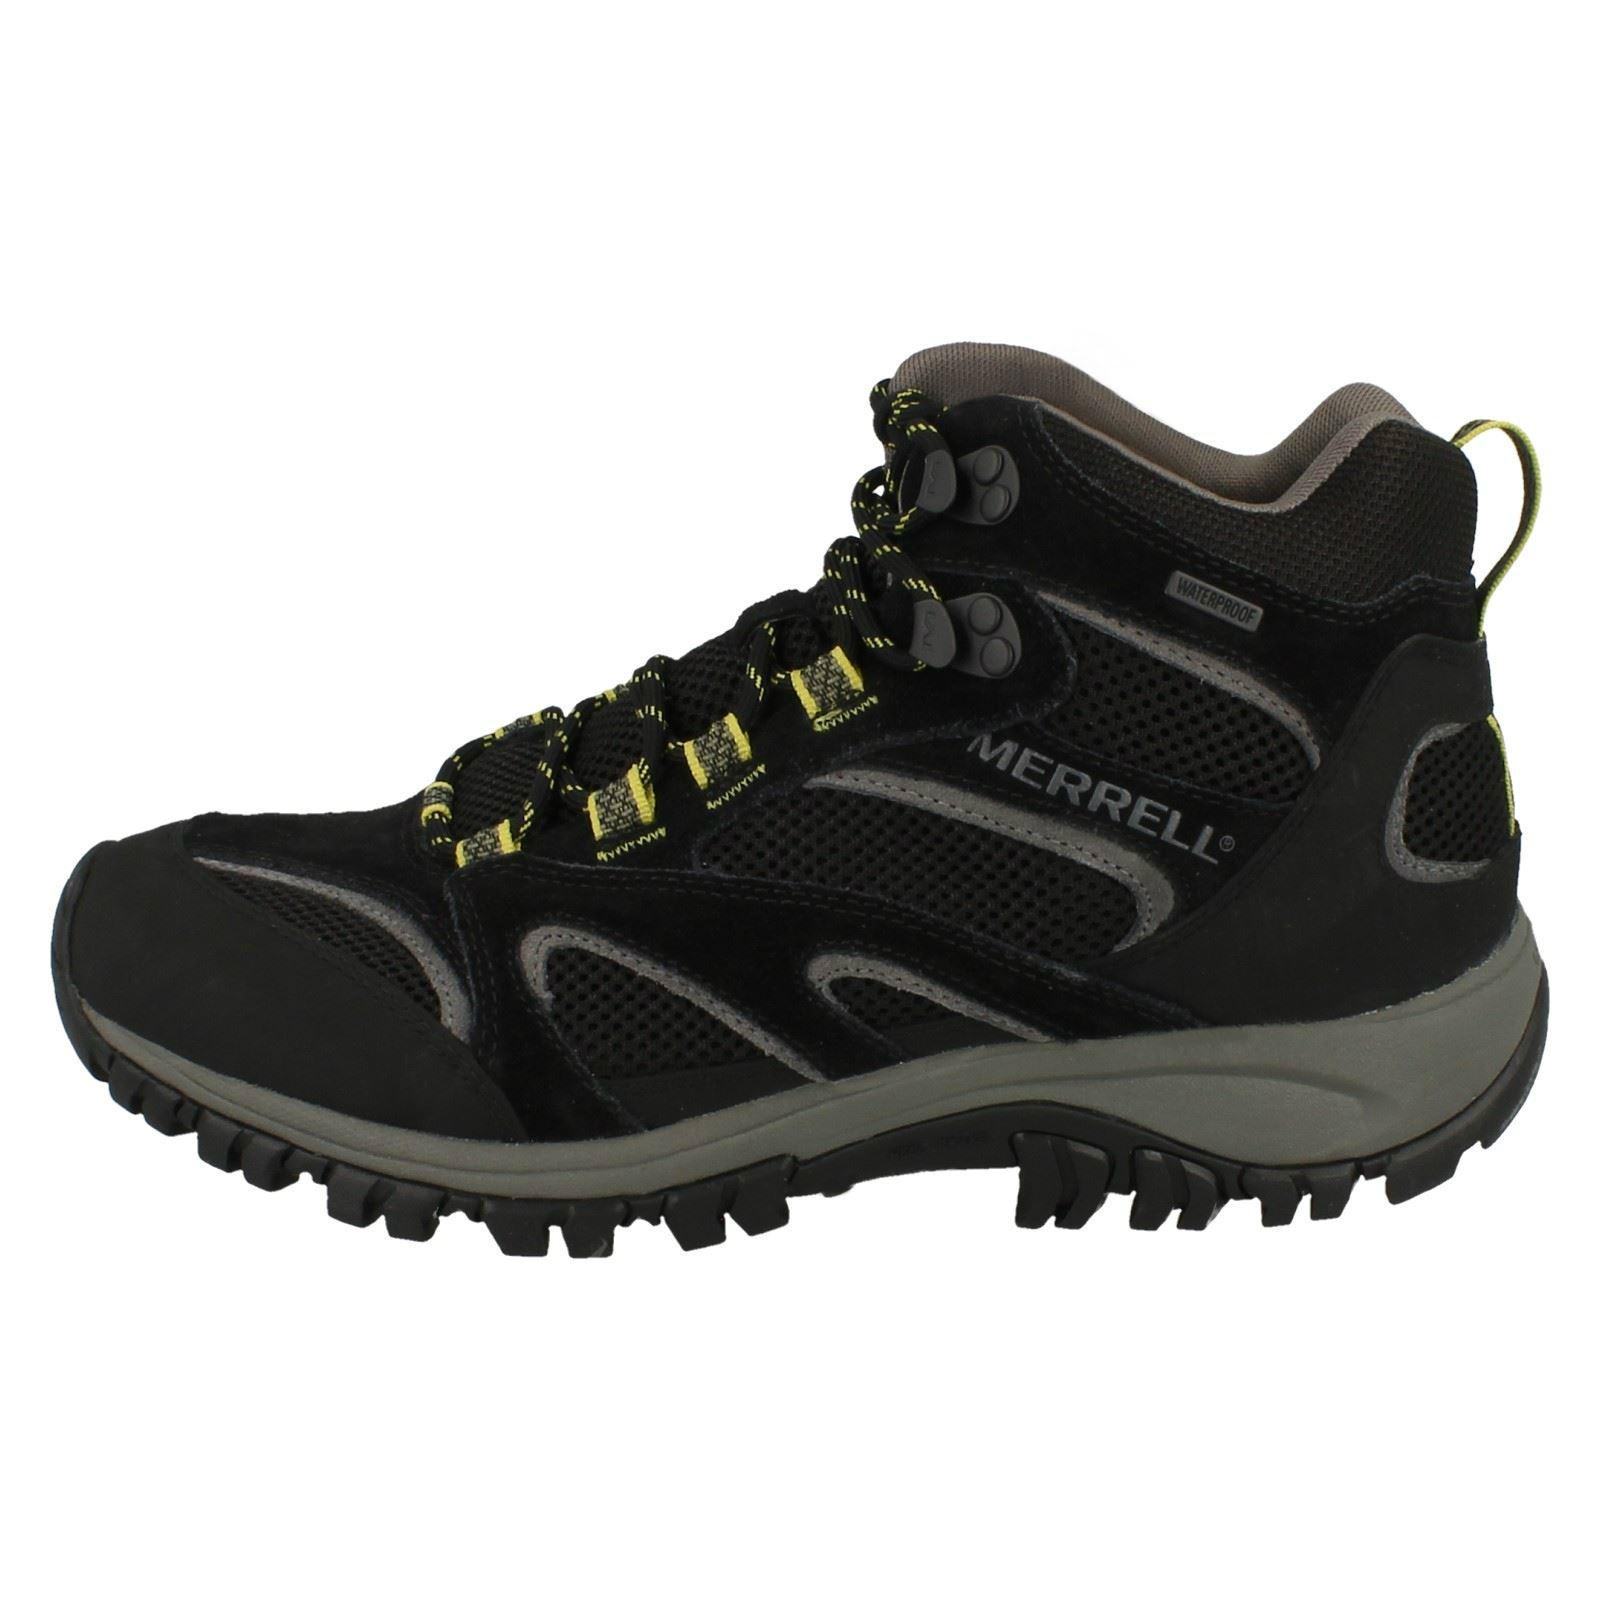 thumbnail 8 - Mens-Merrell-Waterproof-Walking-Boots-Phoenix-Mid